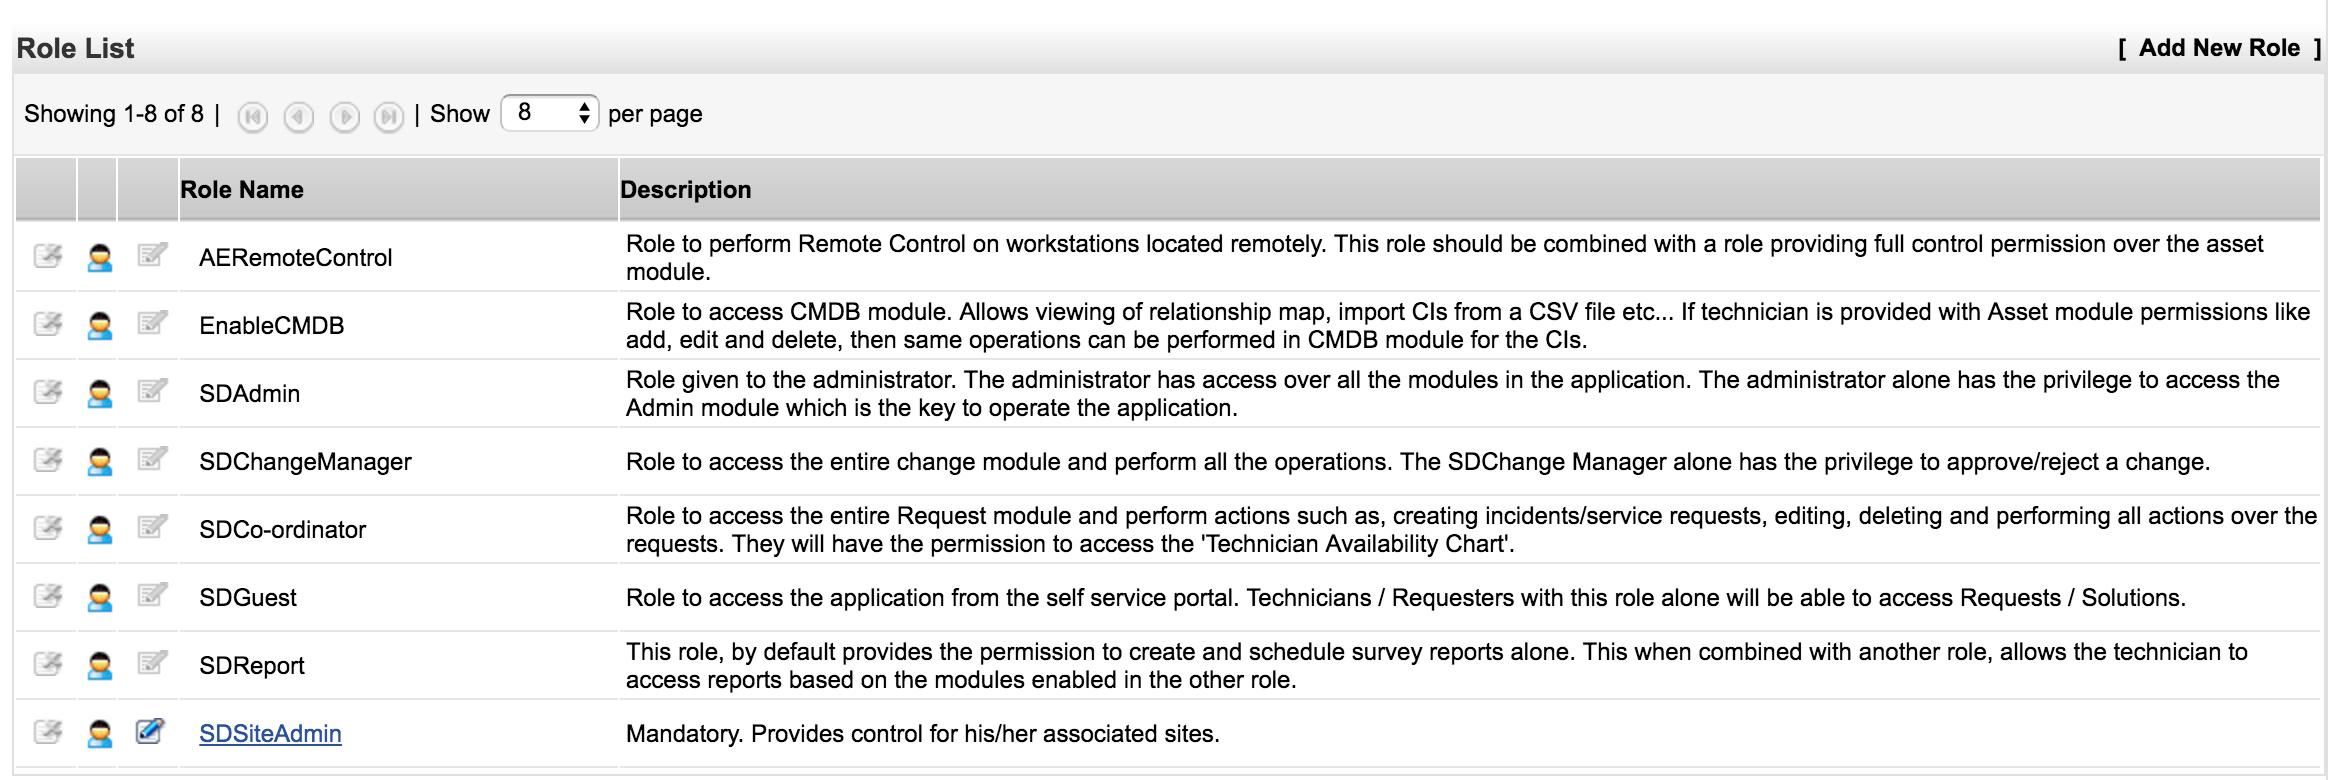 User roles | Help desk customizer - SDP help desk guide